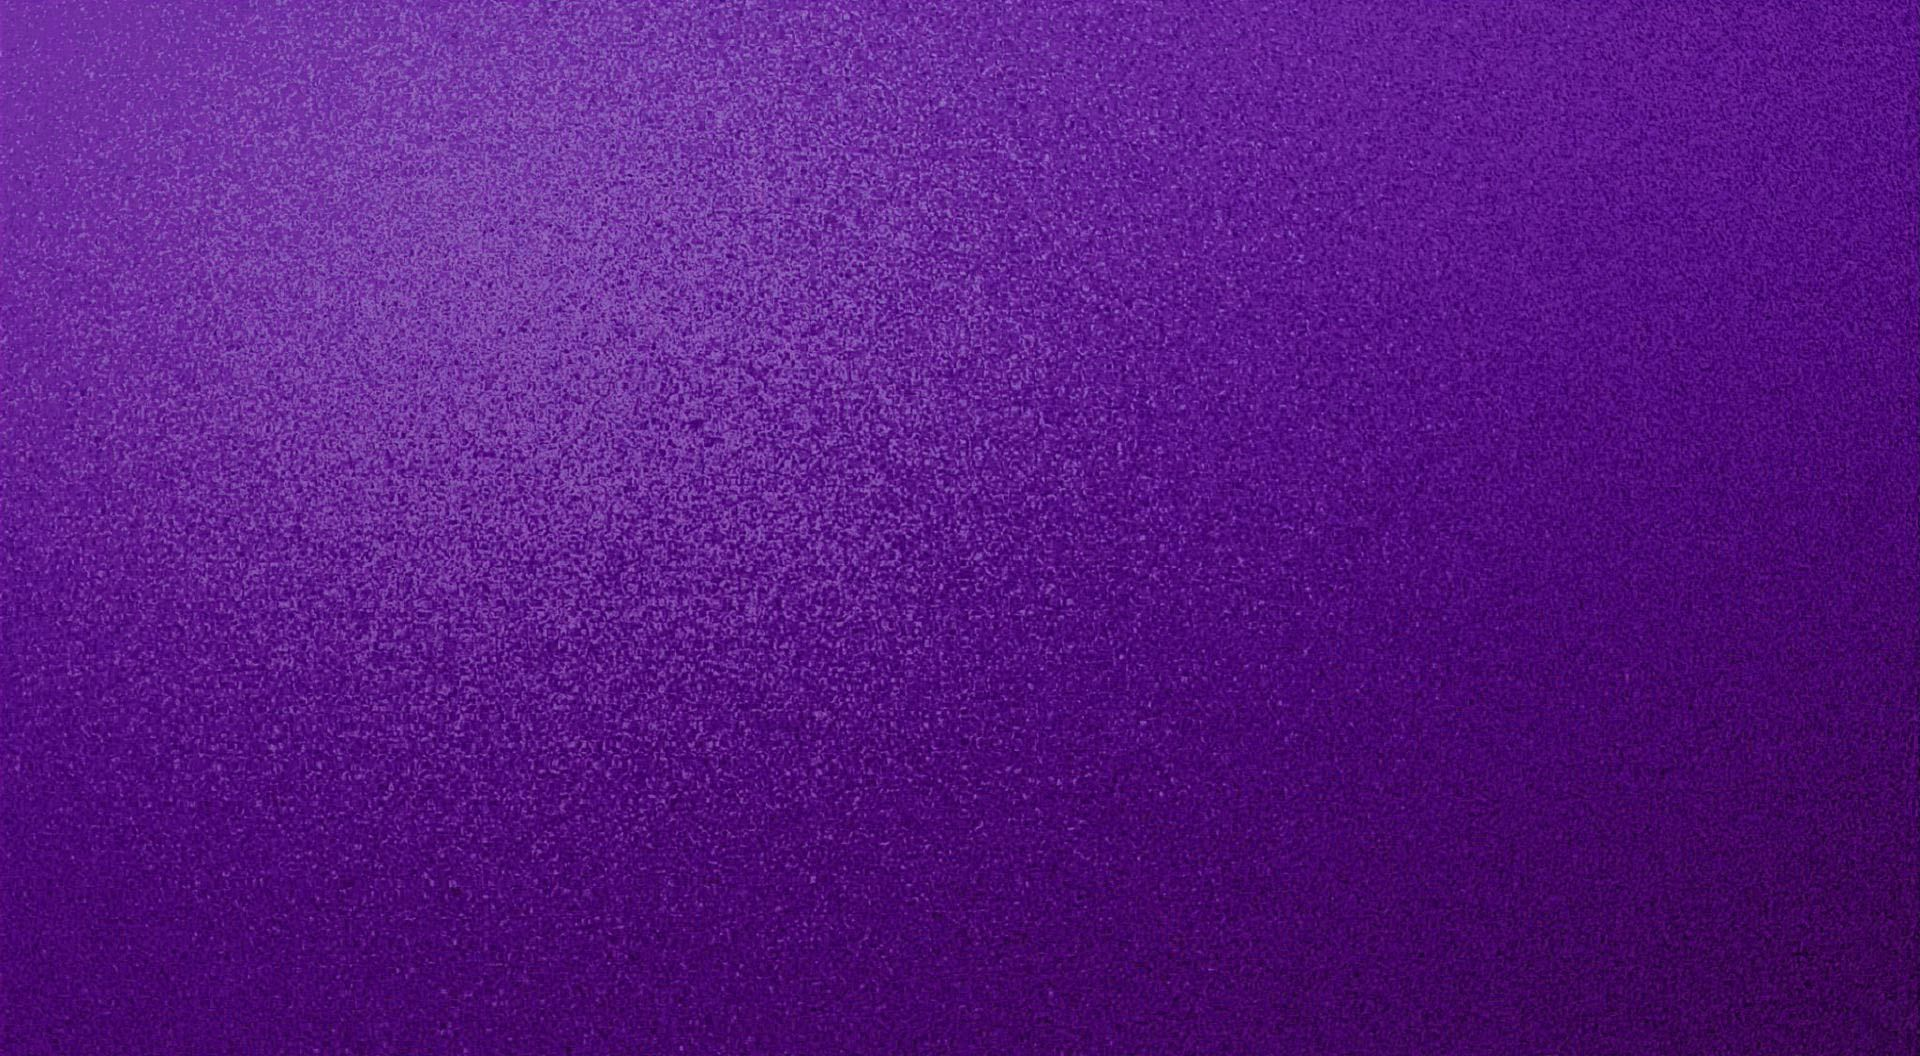 Background Wallpaper Hd 1920x1056